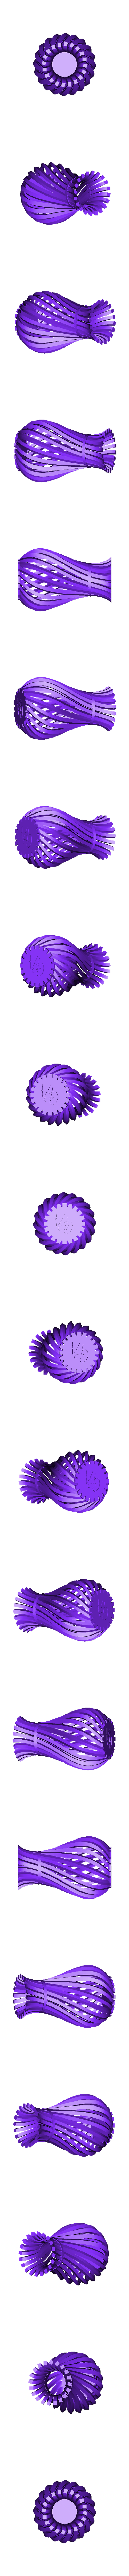 WeirdVaseGFA.stl Download free STL file Weird Twisty Vase • 3D print template, GeekyFayeArt